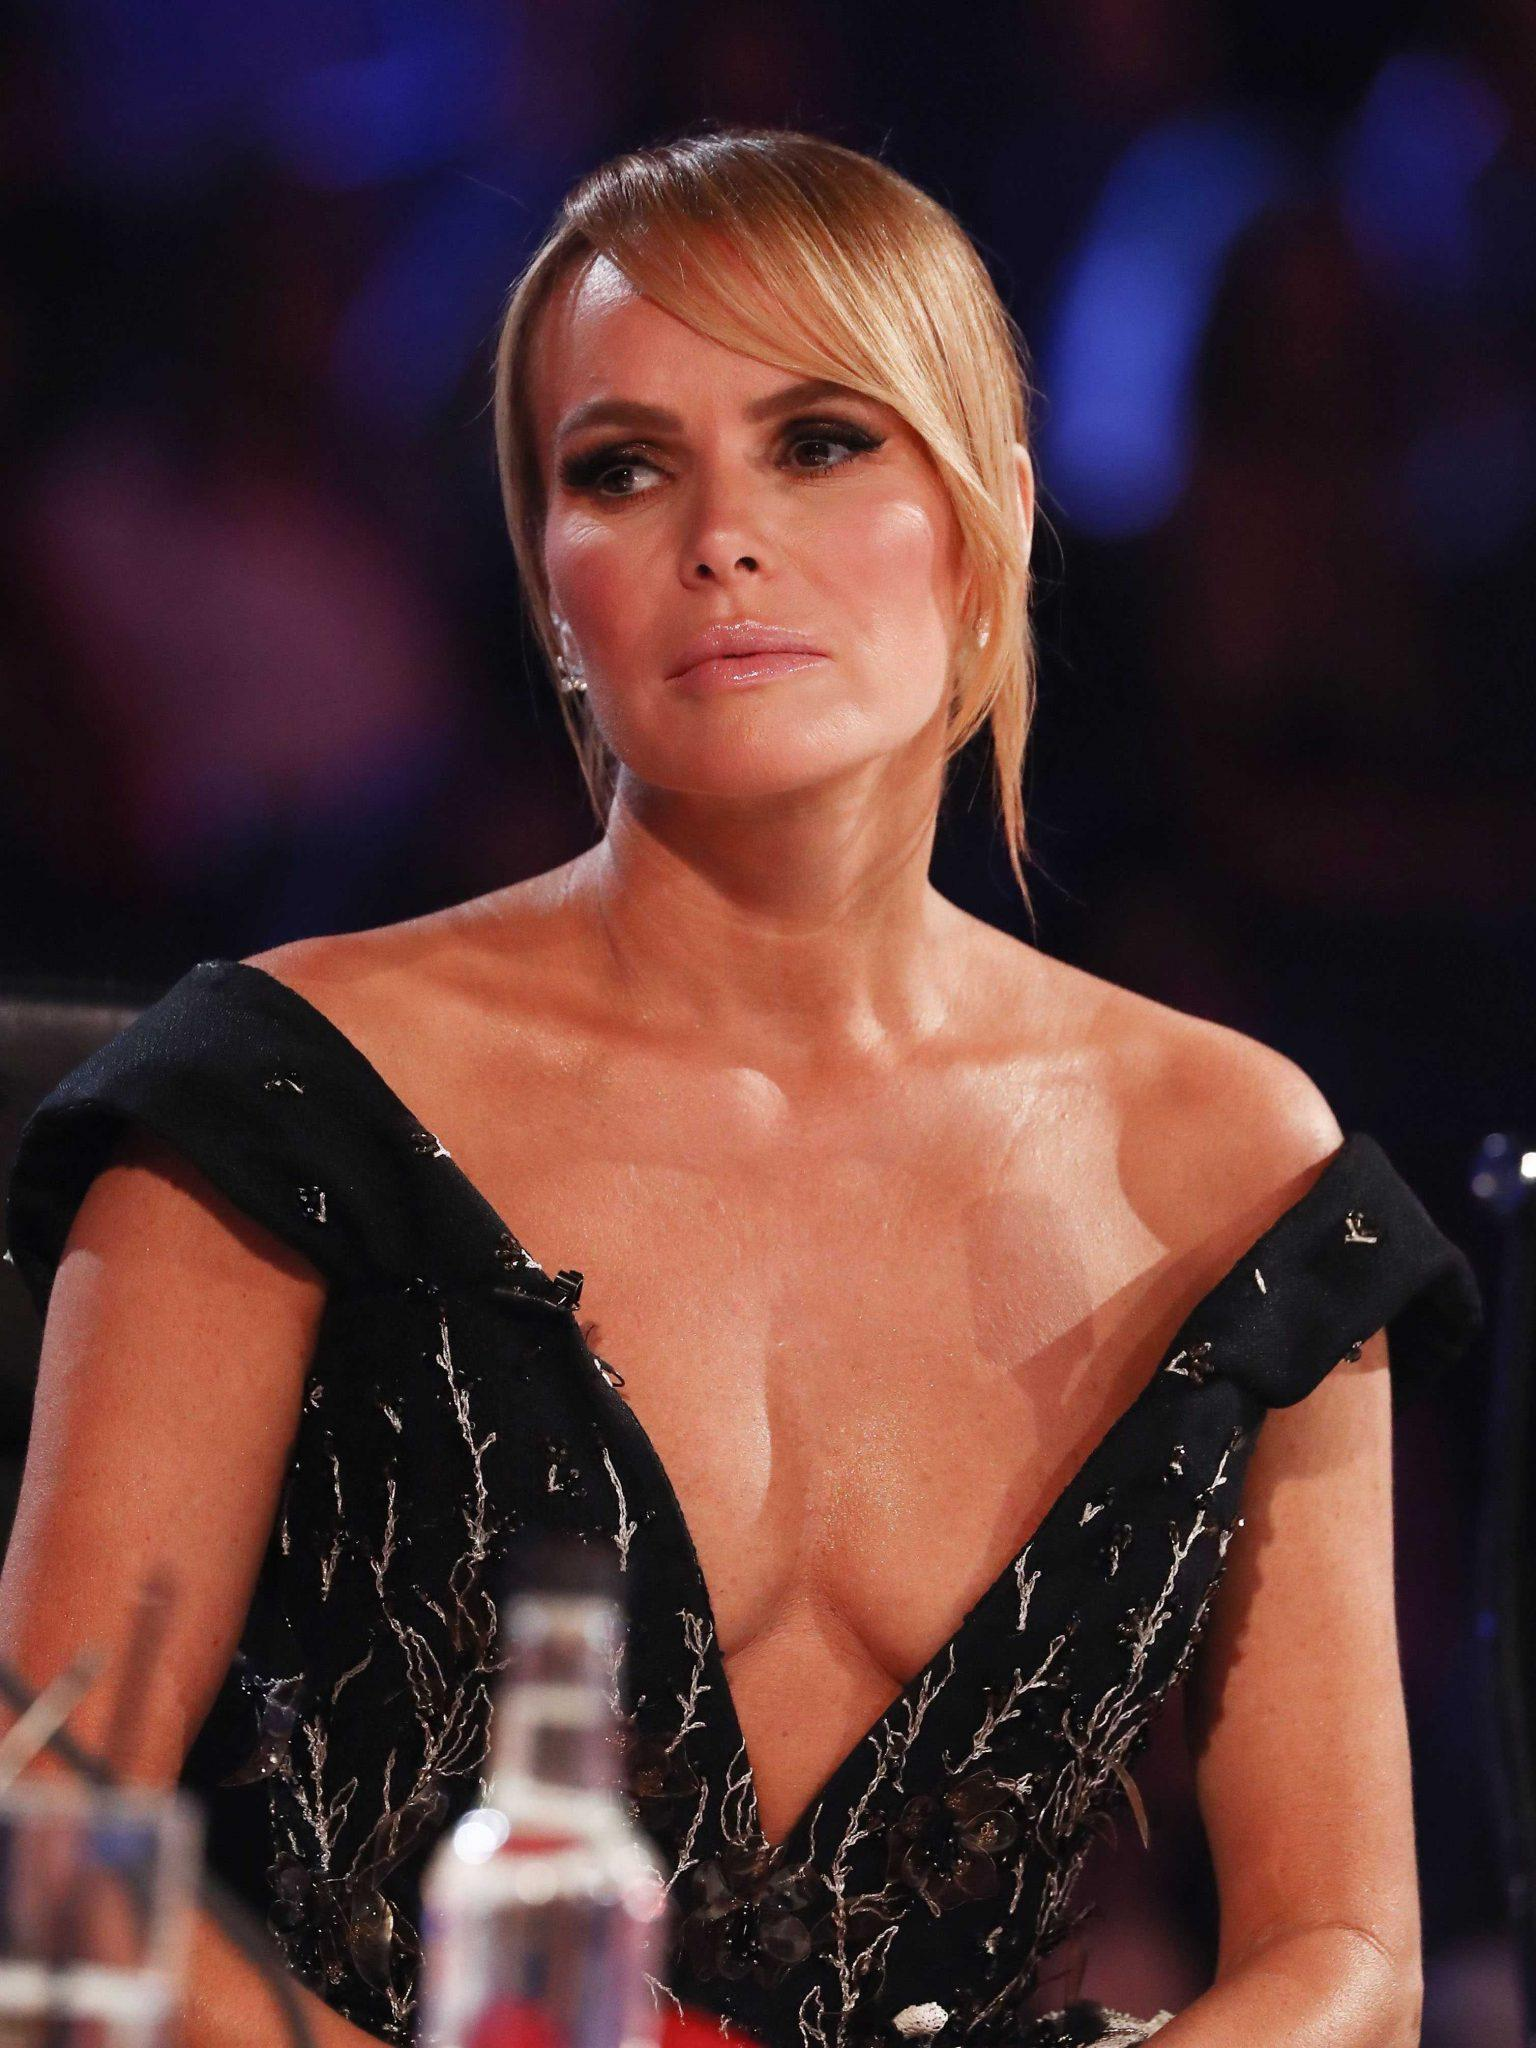 Amanda Holden cleavage pic